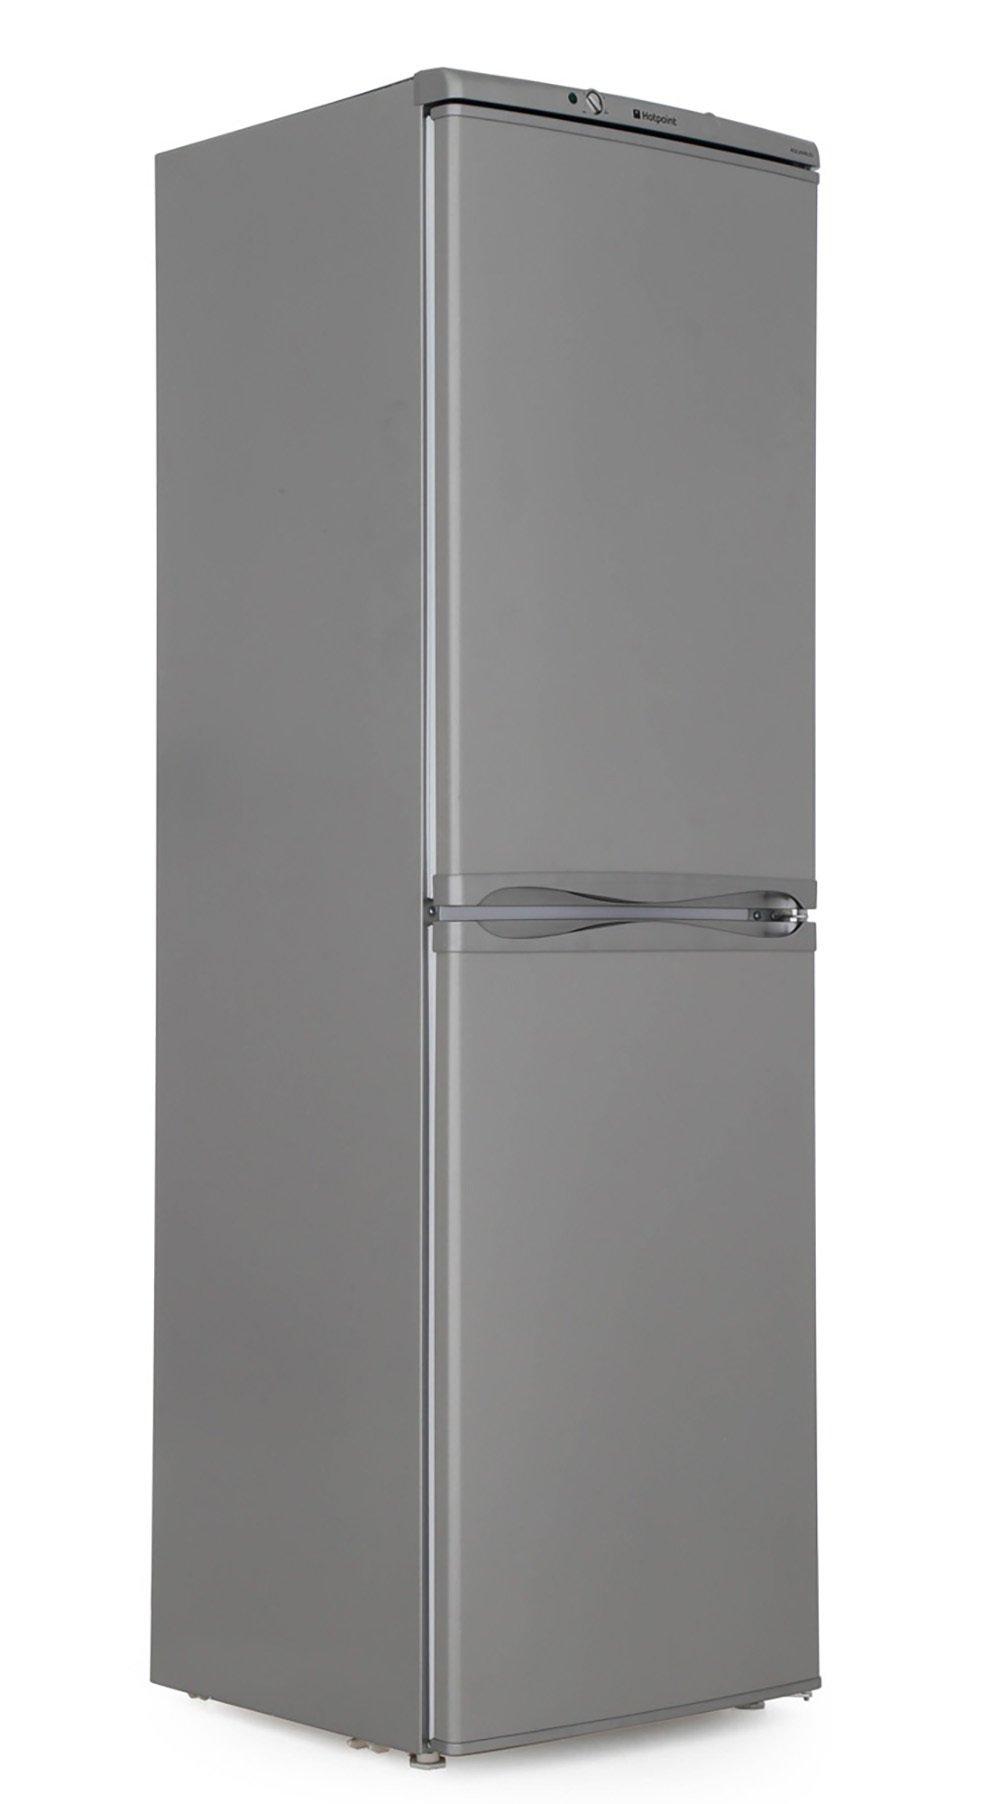 Hotpoint Aquarius HBNF5517S Frost Free Fridge Freezer